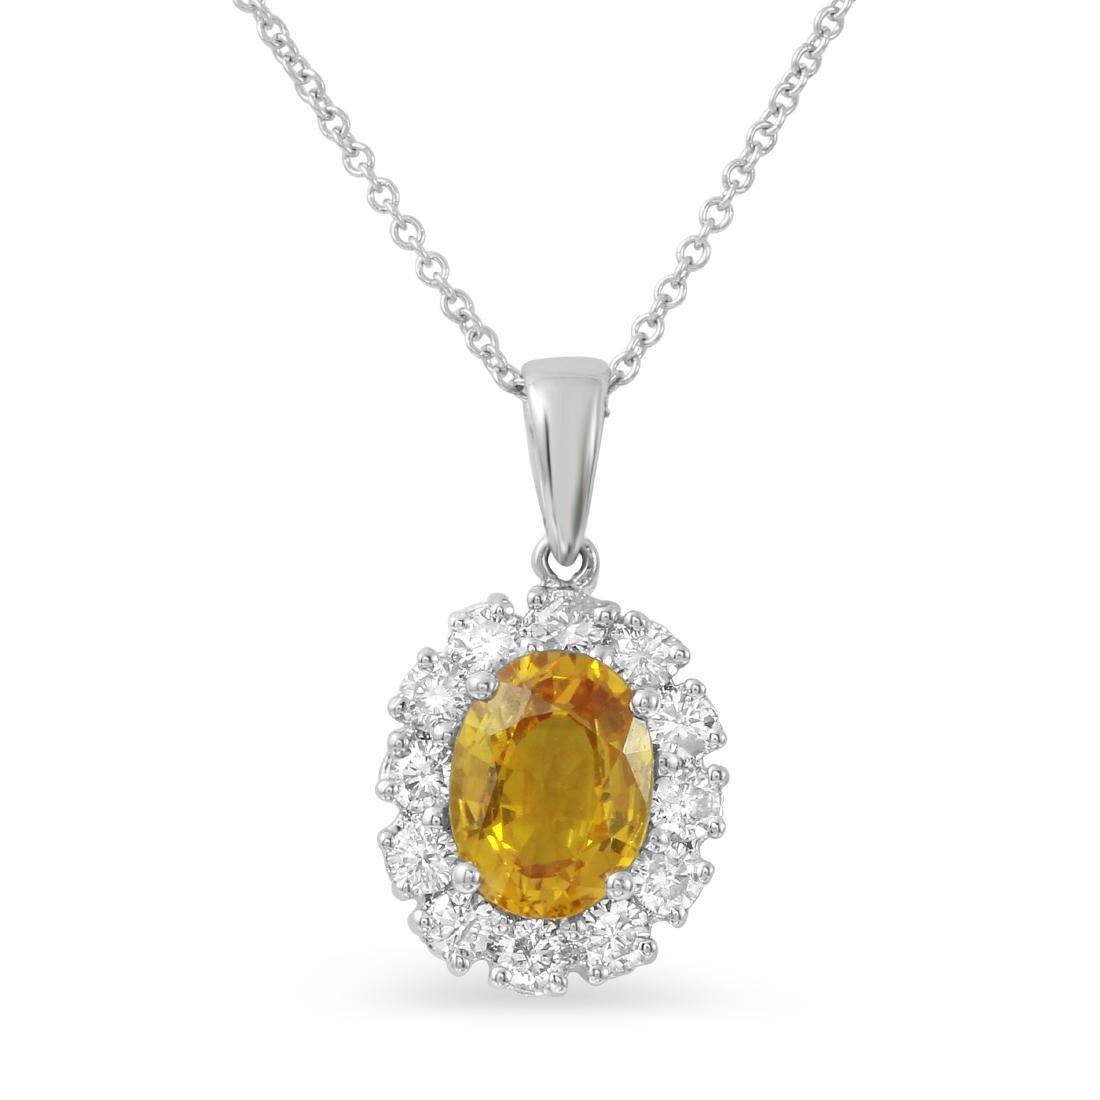 14KT White Gold 1.63ct Yellow Sapphire and Diamond